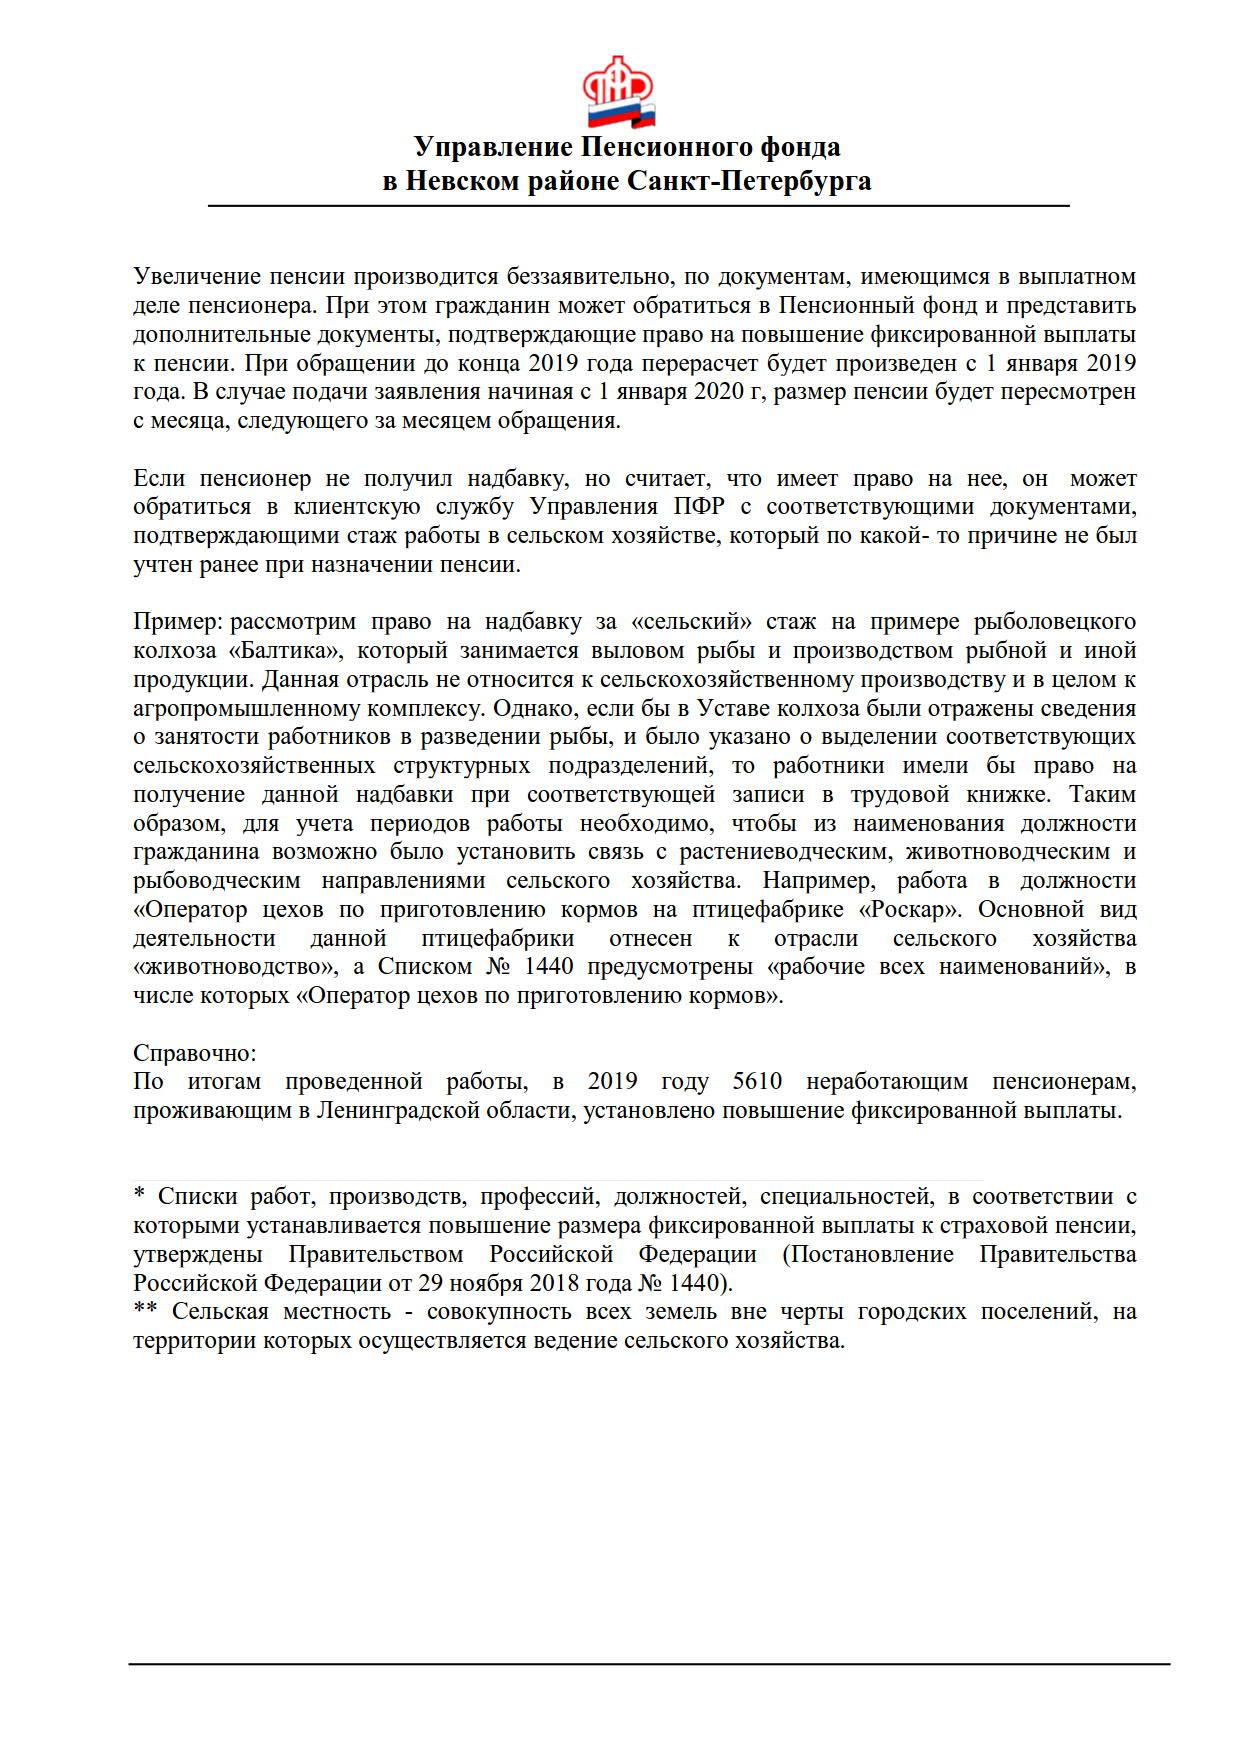 Прибавка к пенсии жителям села_3